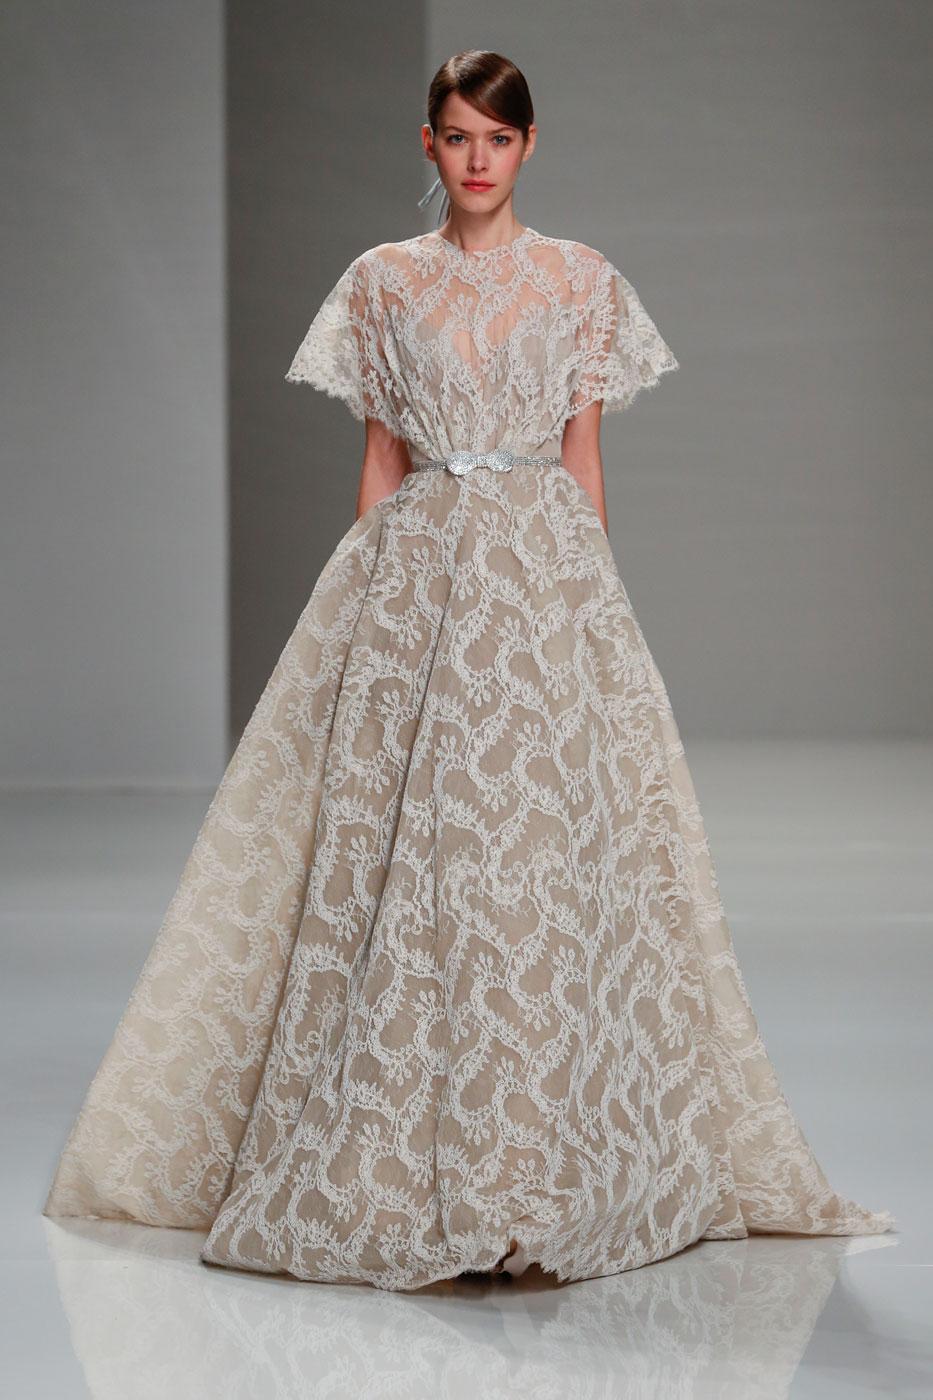 Georges-Hobeika-fashion-runway-show-haute-couture-paris-spring-2015-the-impression-59